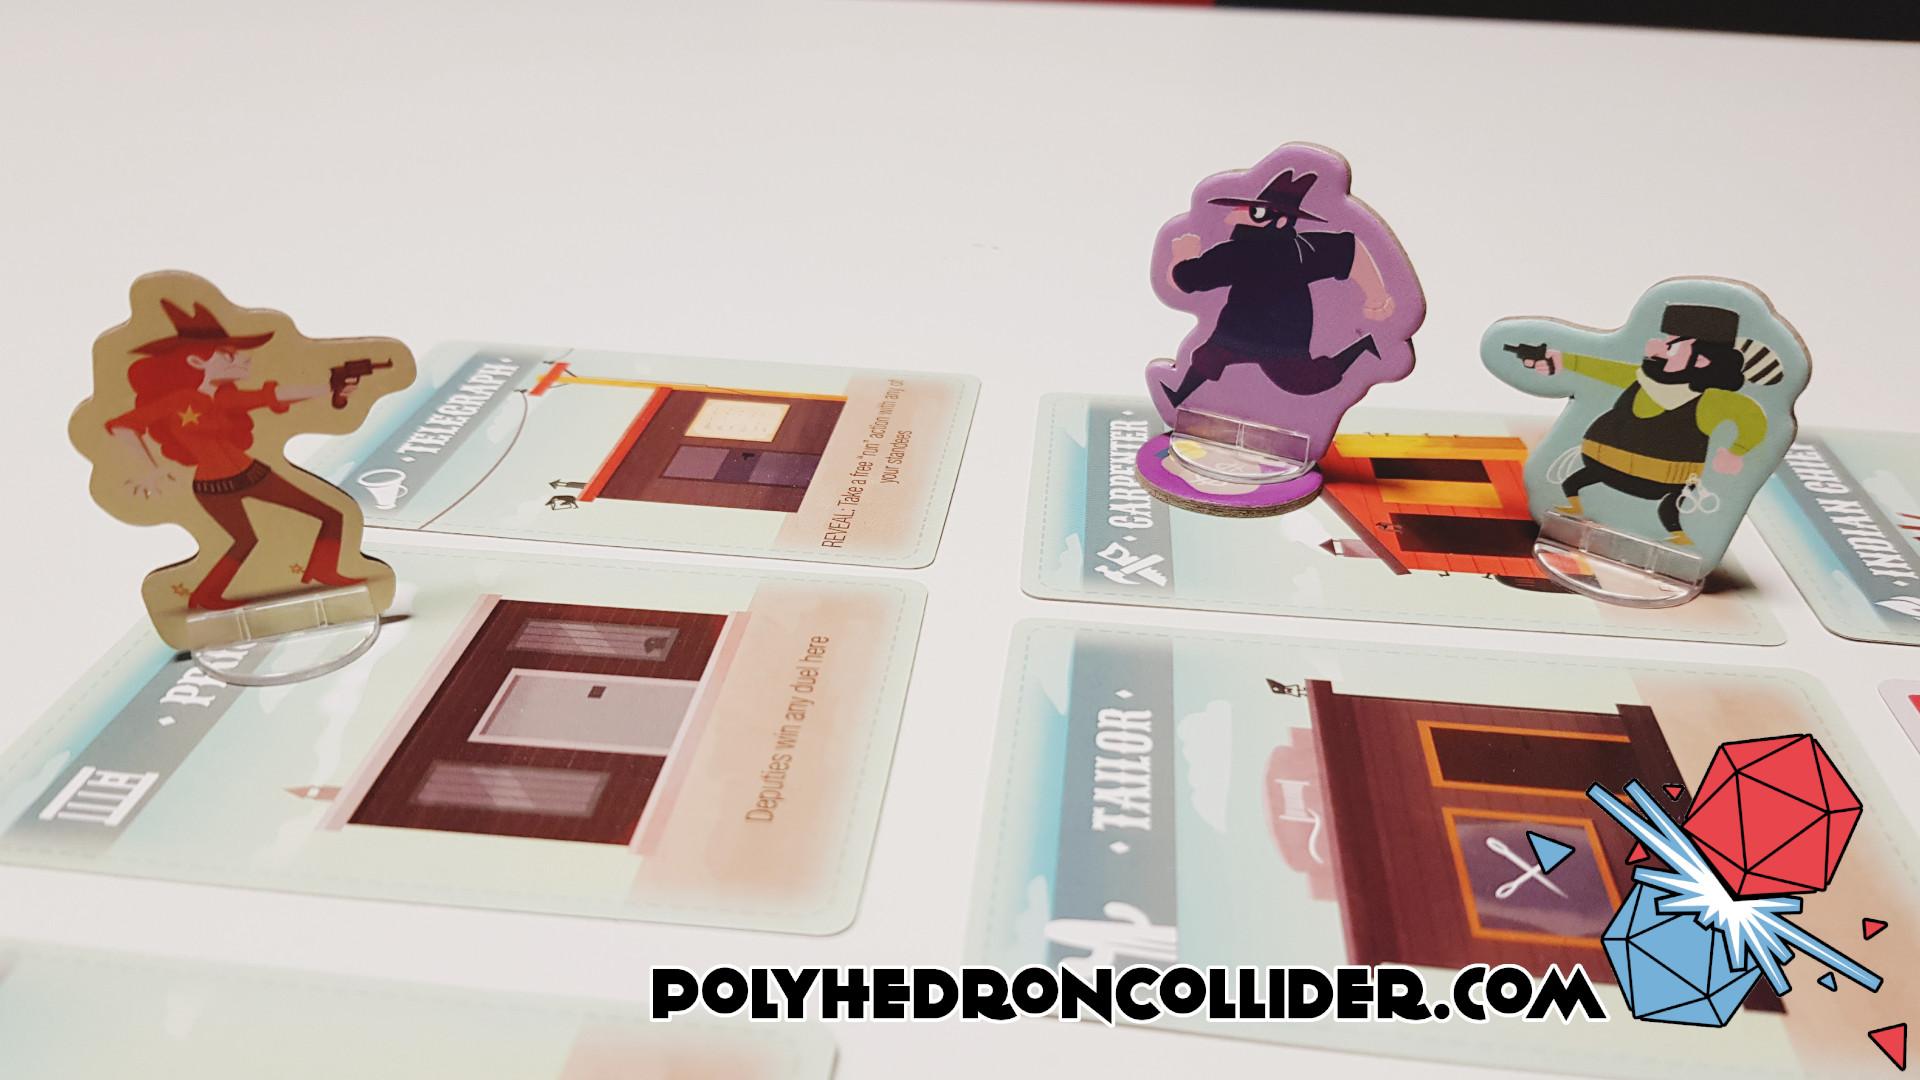 Polyhedron Collider Cactus Town Review - The Escape